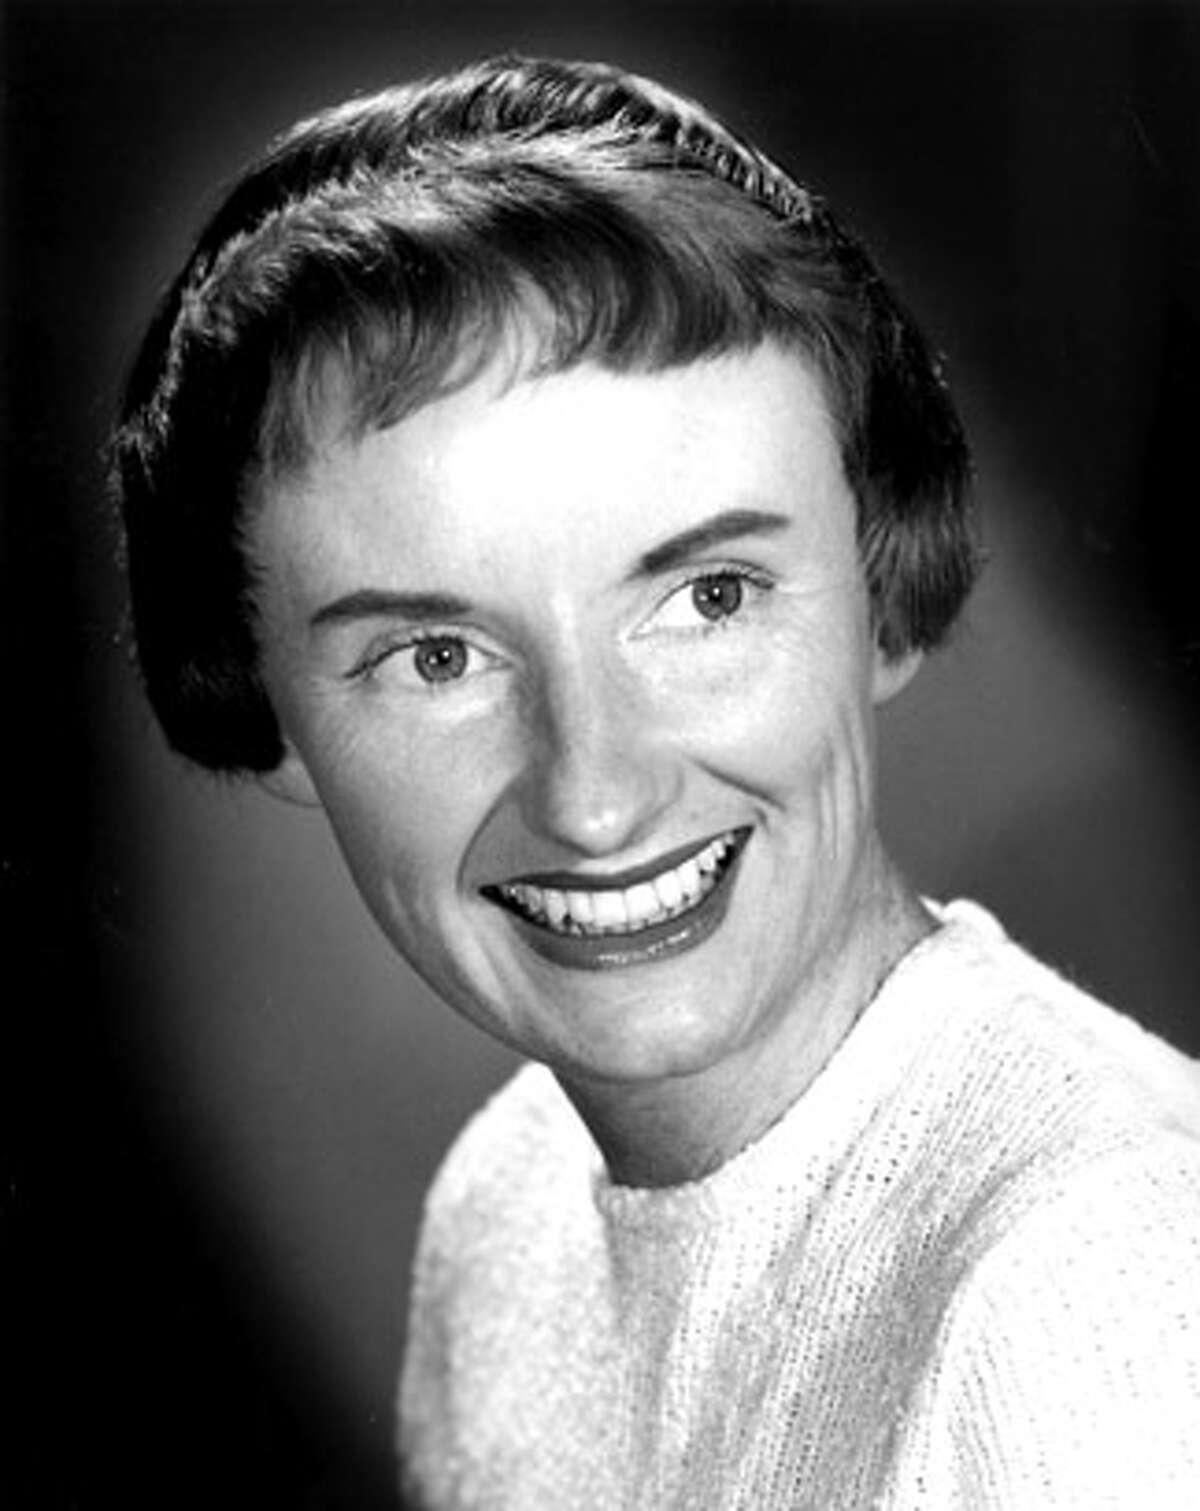 Phyllis Diller, ~1955 no credit info